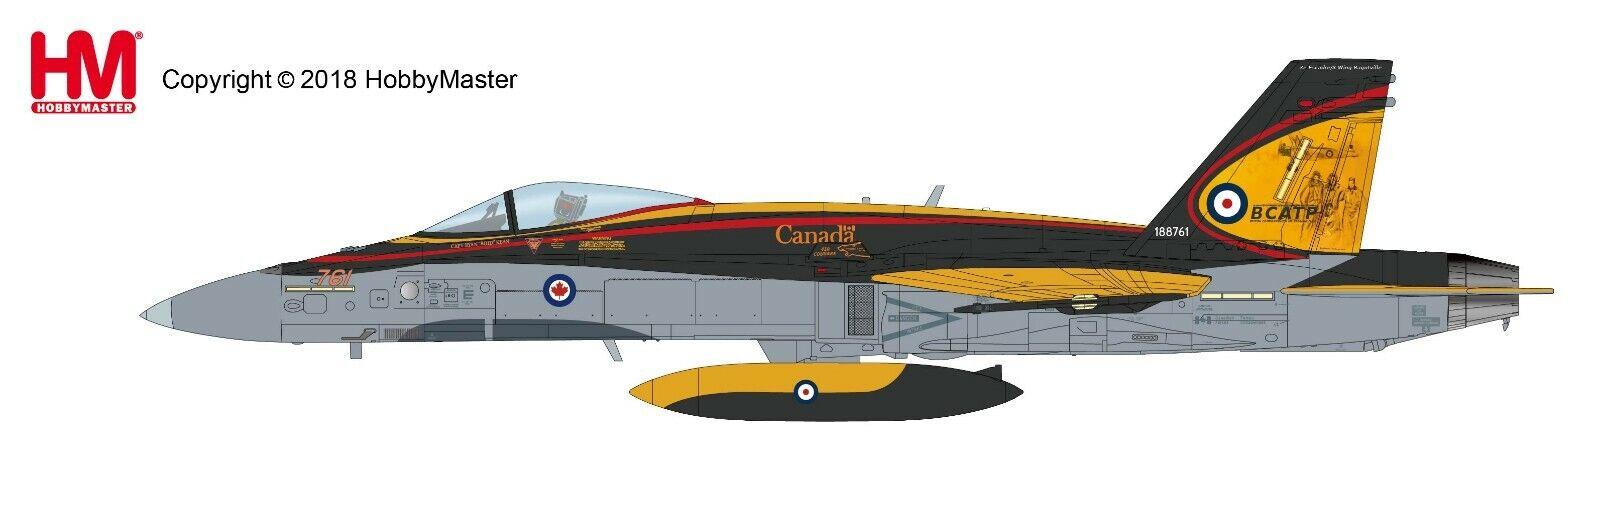 Hobby Master HA3550,CF-188  2016 DEMO  Captain Ryan  Roid  Kean, 2016 1 72